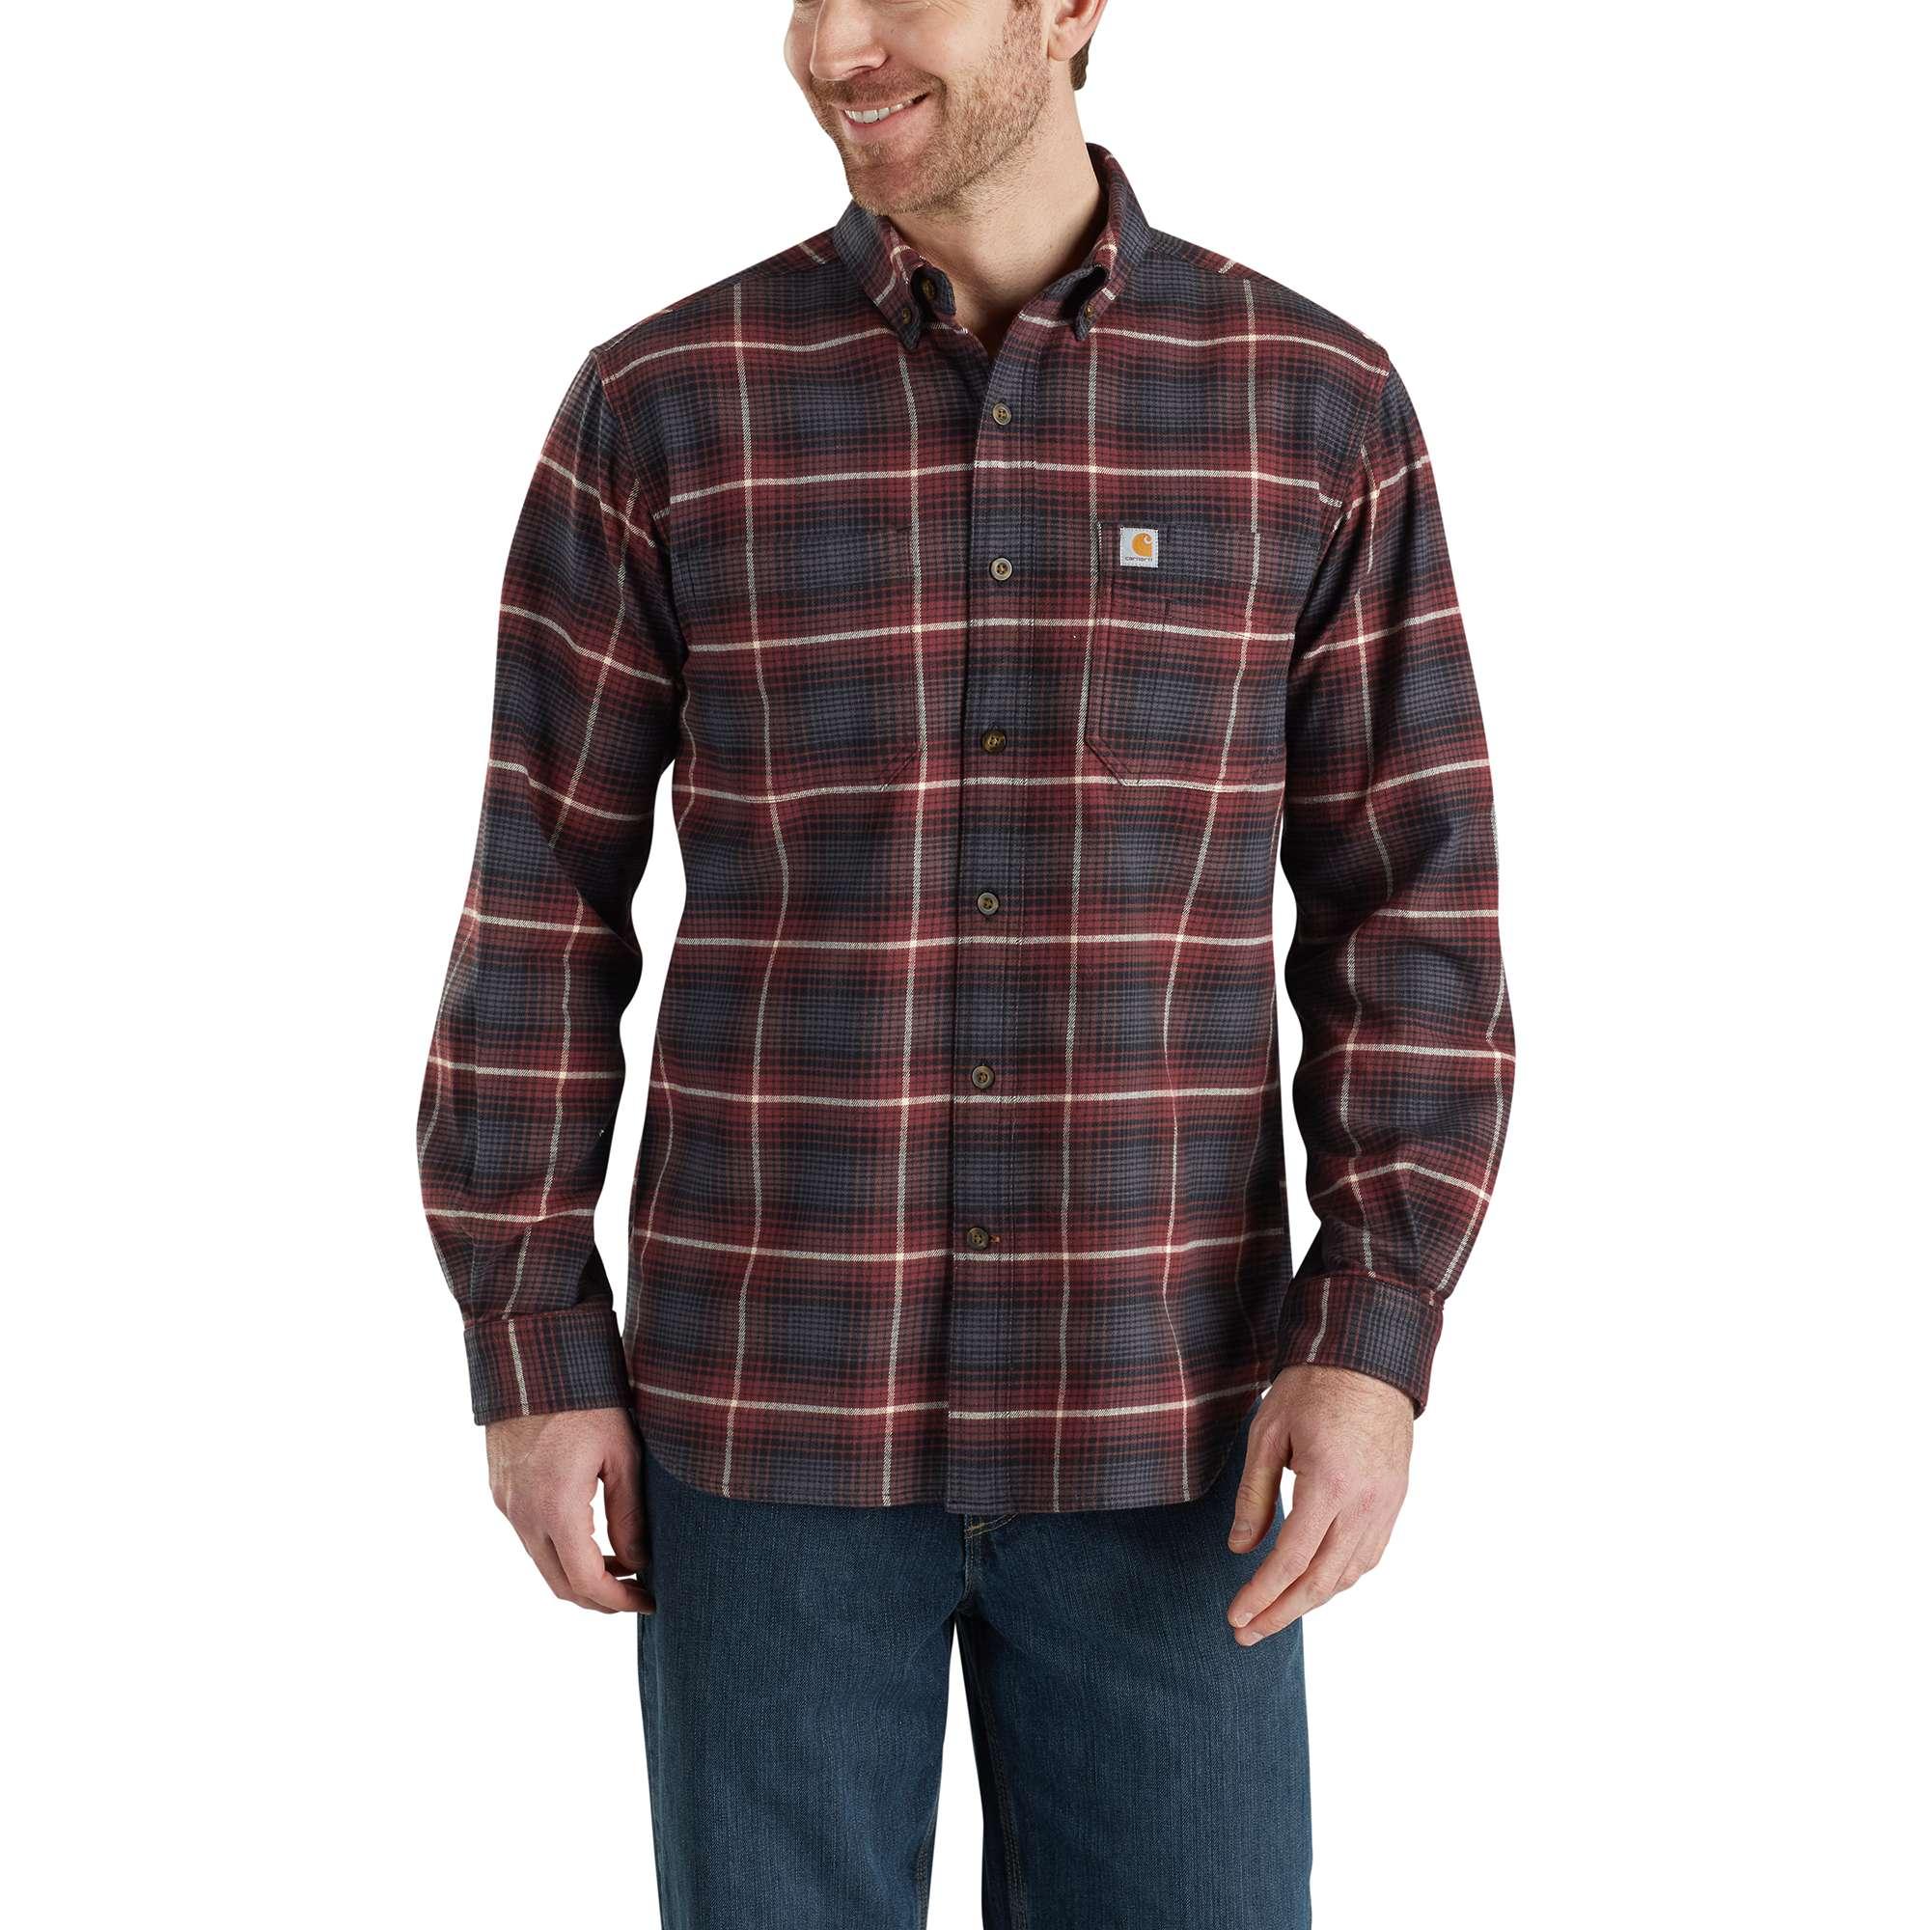 Men's Rugged Flex¨ Hamilton Plaid Long Sleeve Shirt, Brick, swatch